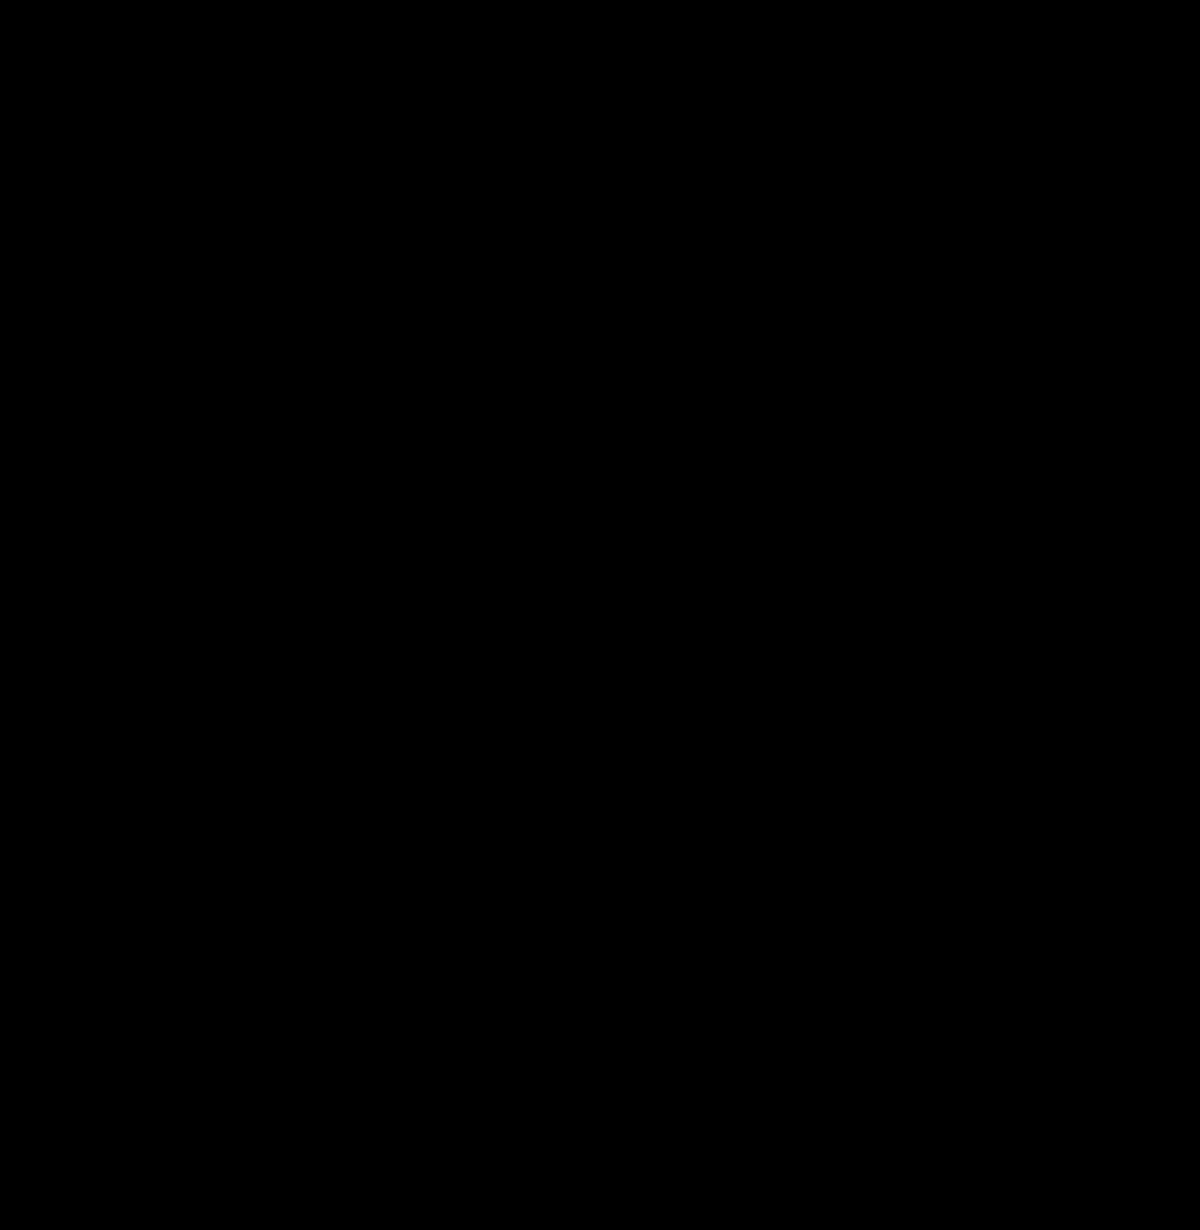 Heptagonal-spiral-layer5